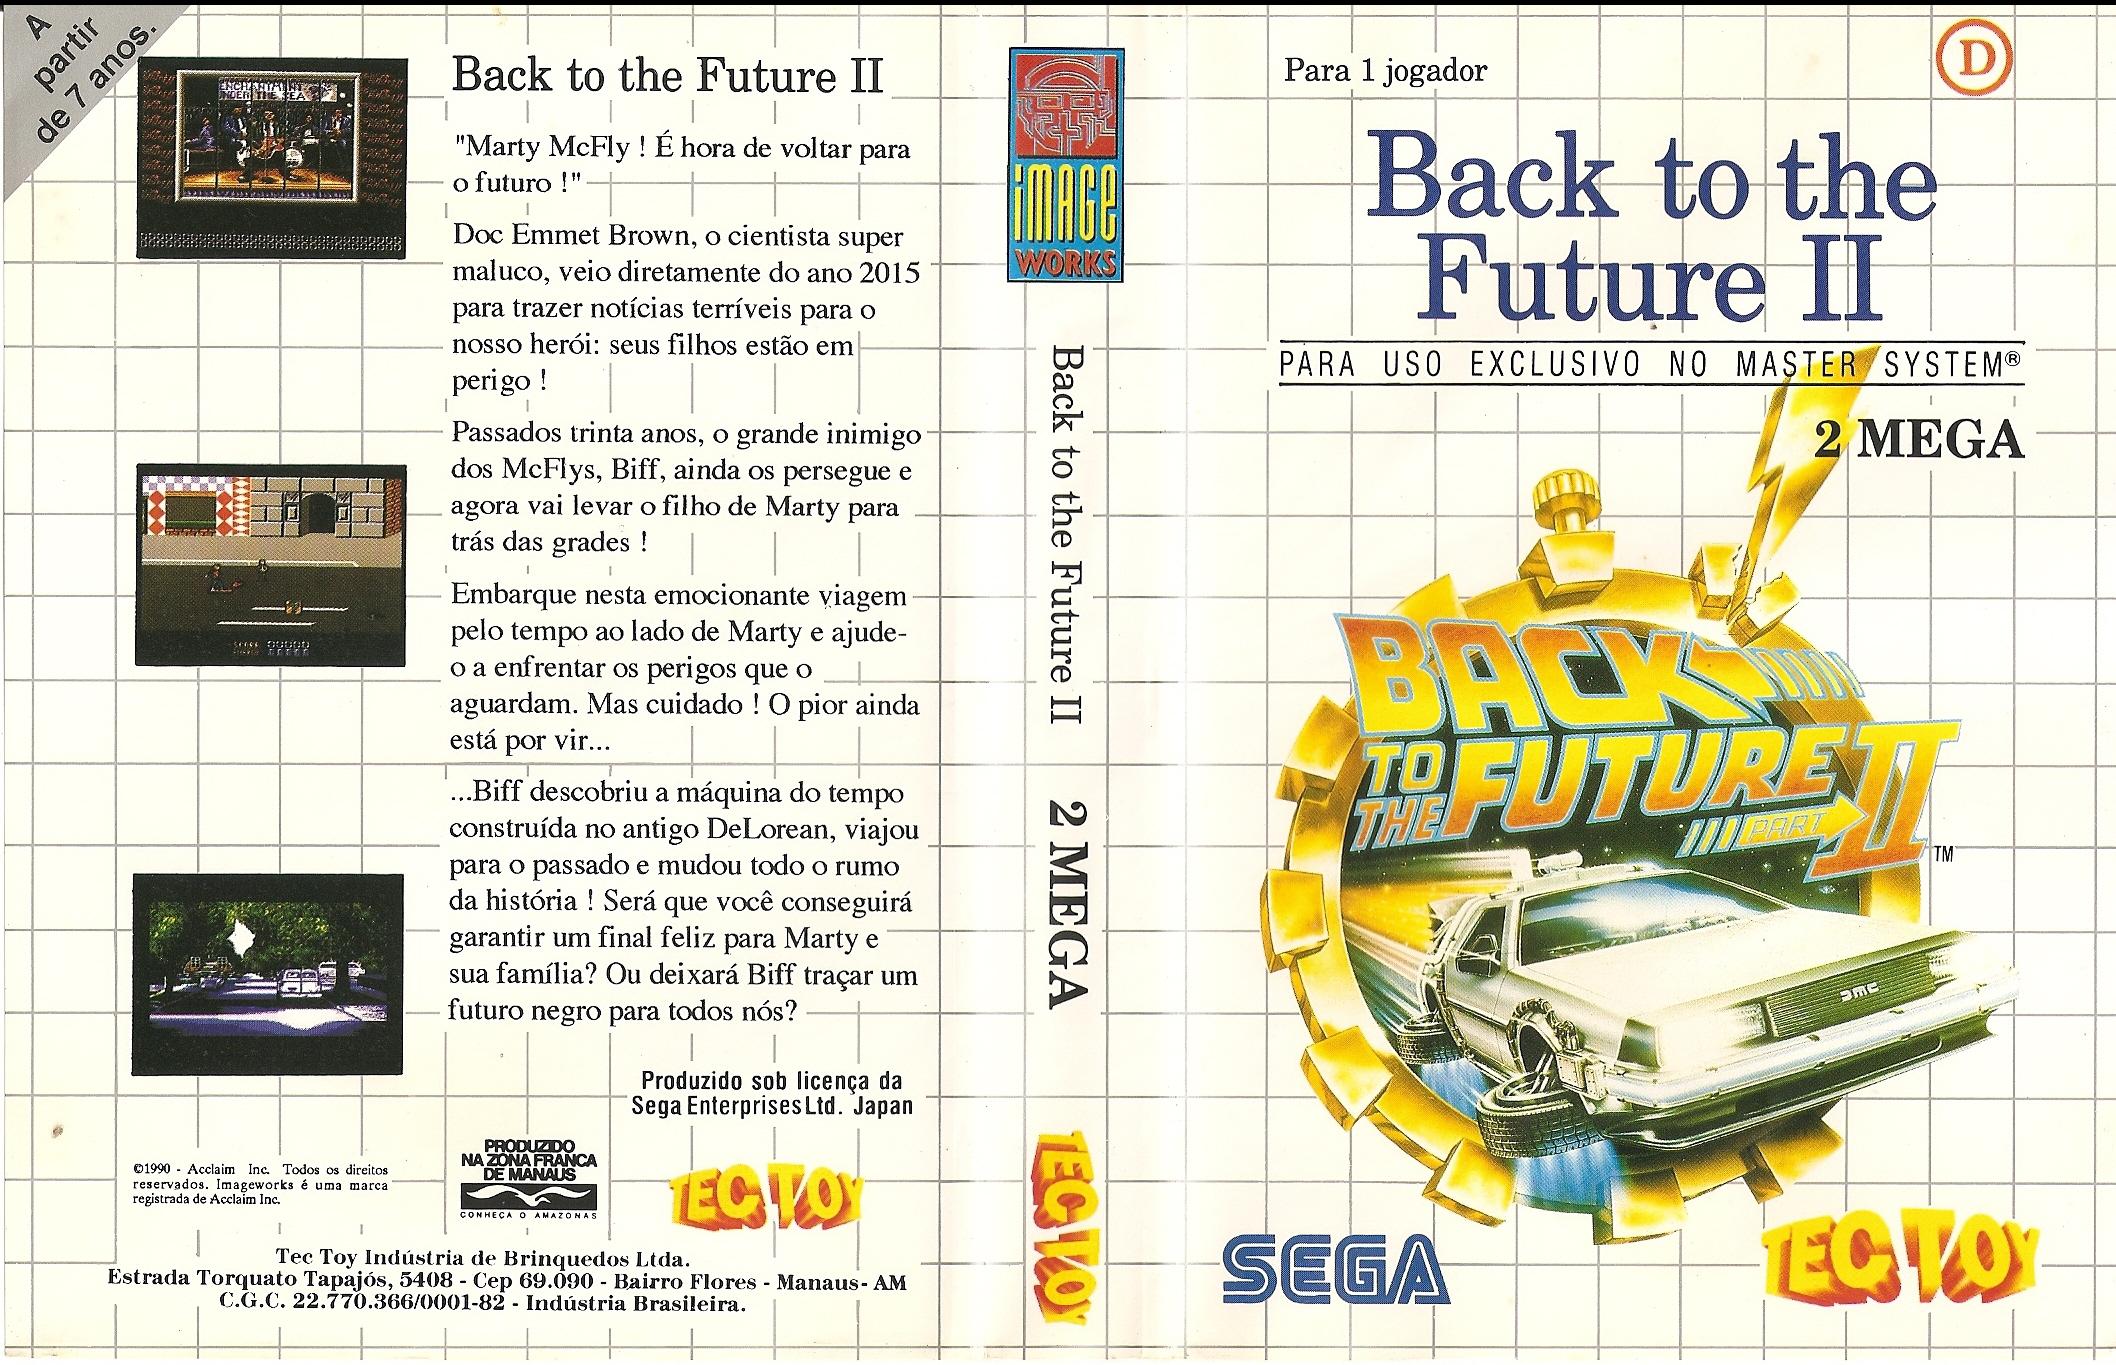 Back to the Future II - TecToy